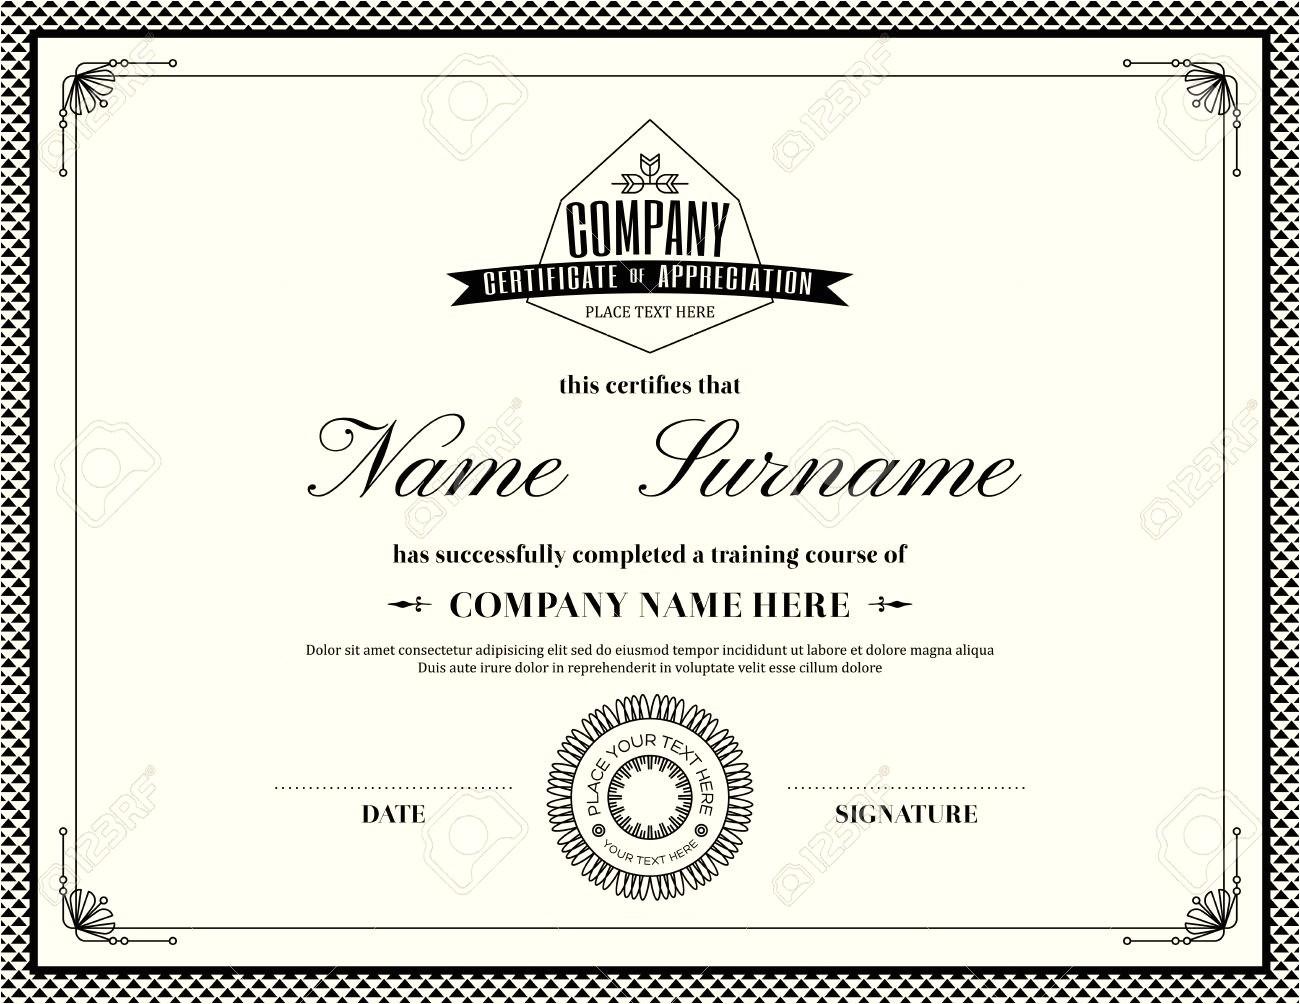 sample military certificate of appreciation